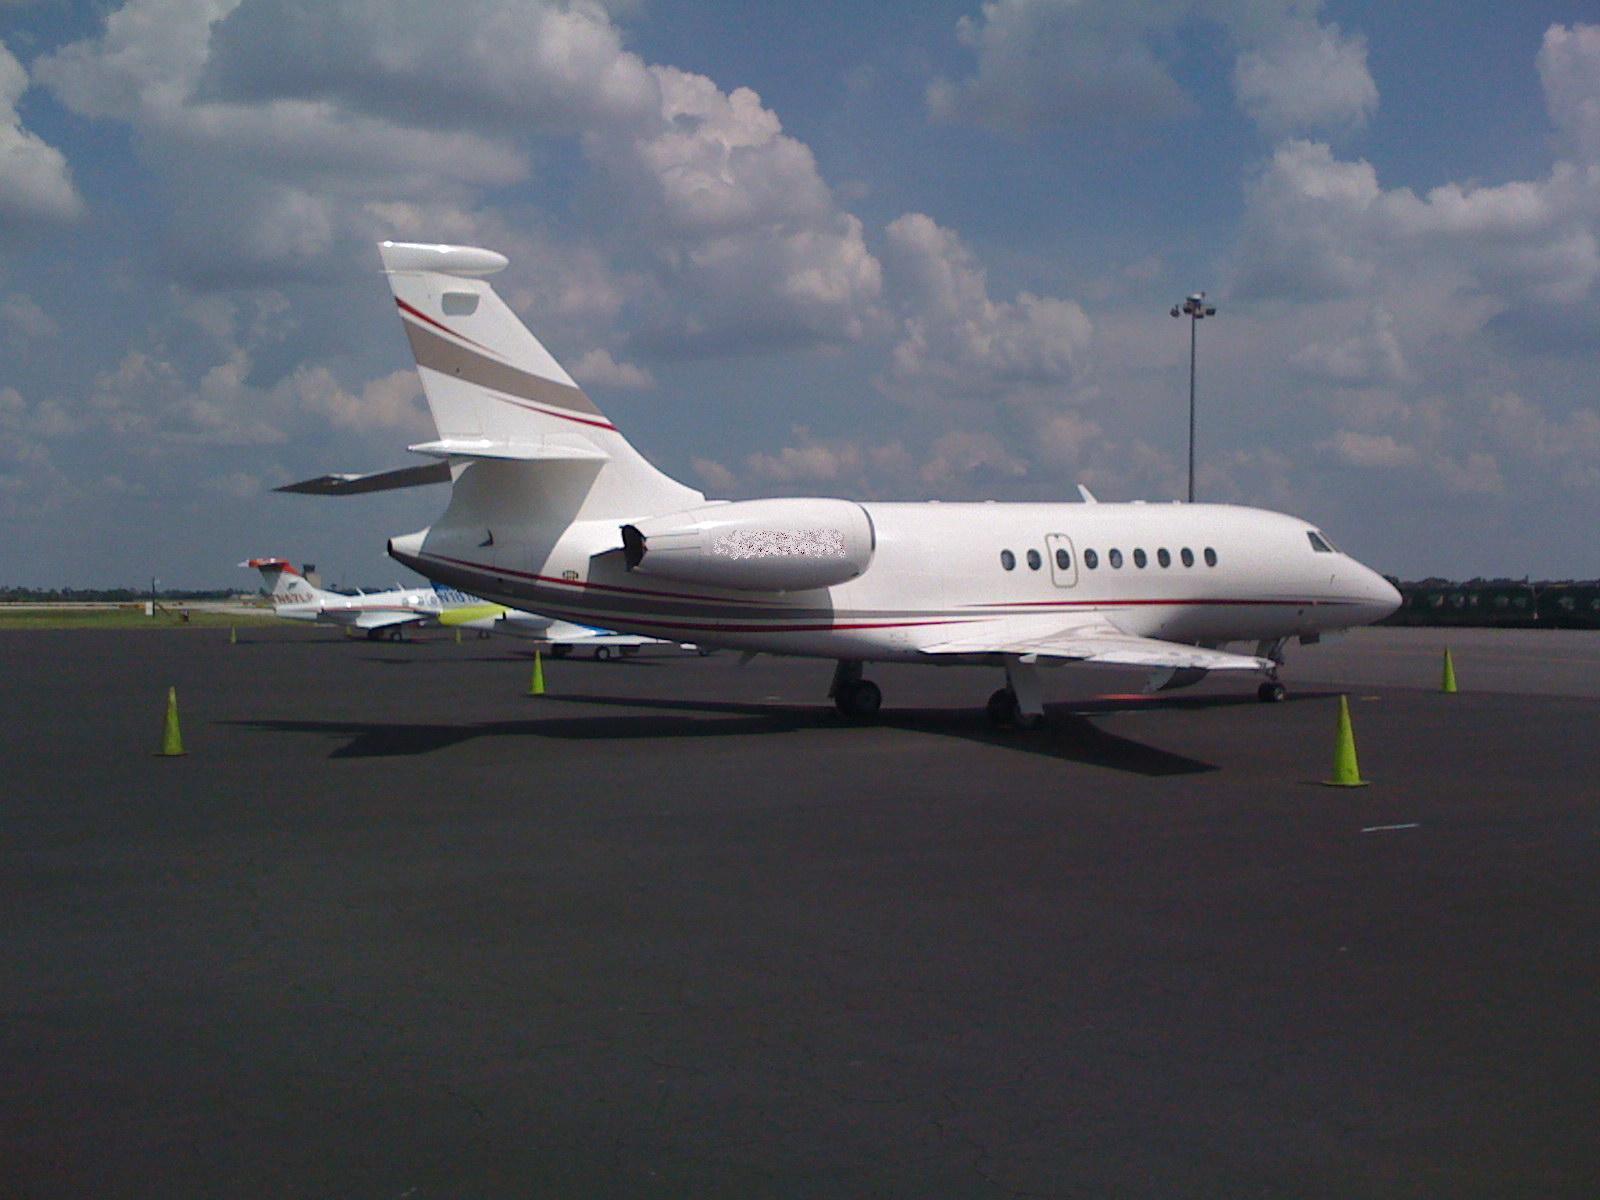 http://3.bp.blogspot.com/--AsQWRvyyIs/TZ7iF5KY1dI/AAAAAAAADxQ/t--YY9BbFKU/s1600/Dassault+Falcon+2000EX+by+jet+planes+%252815%2529.jpg